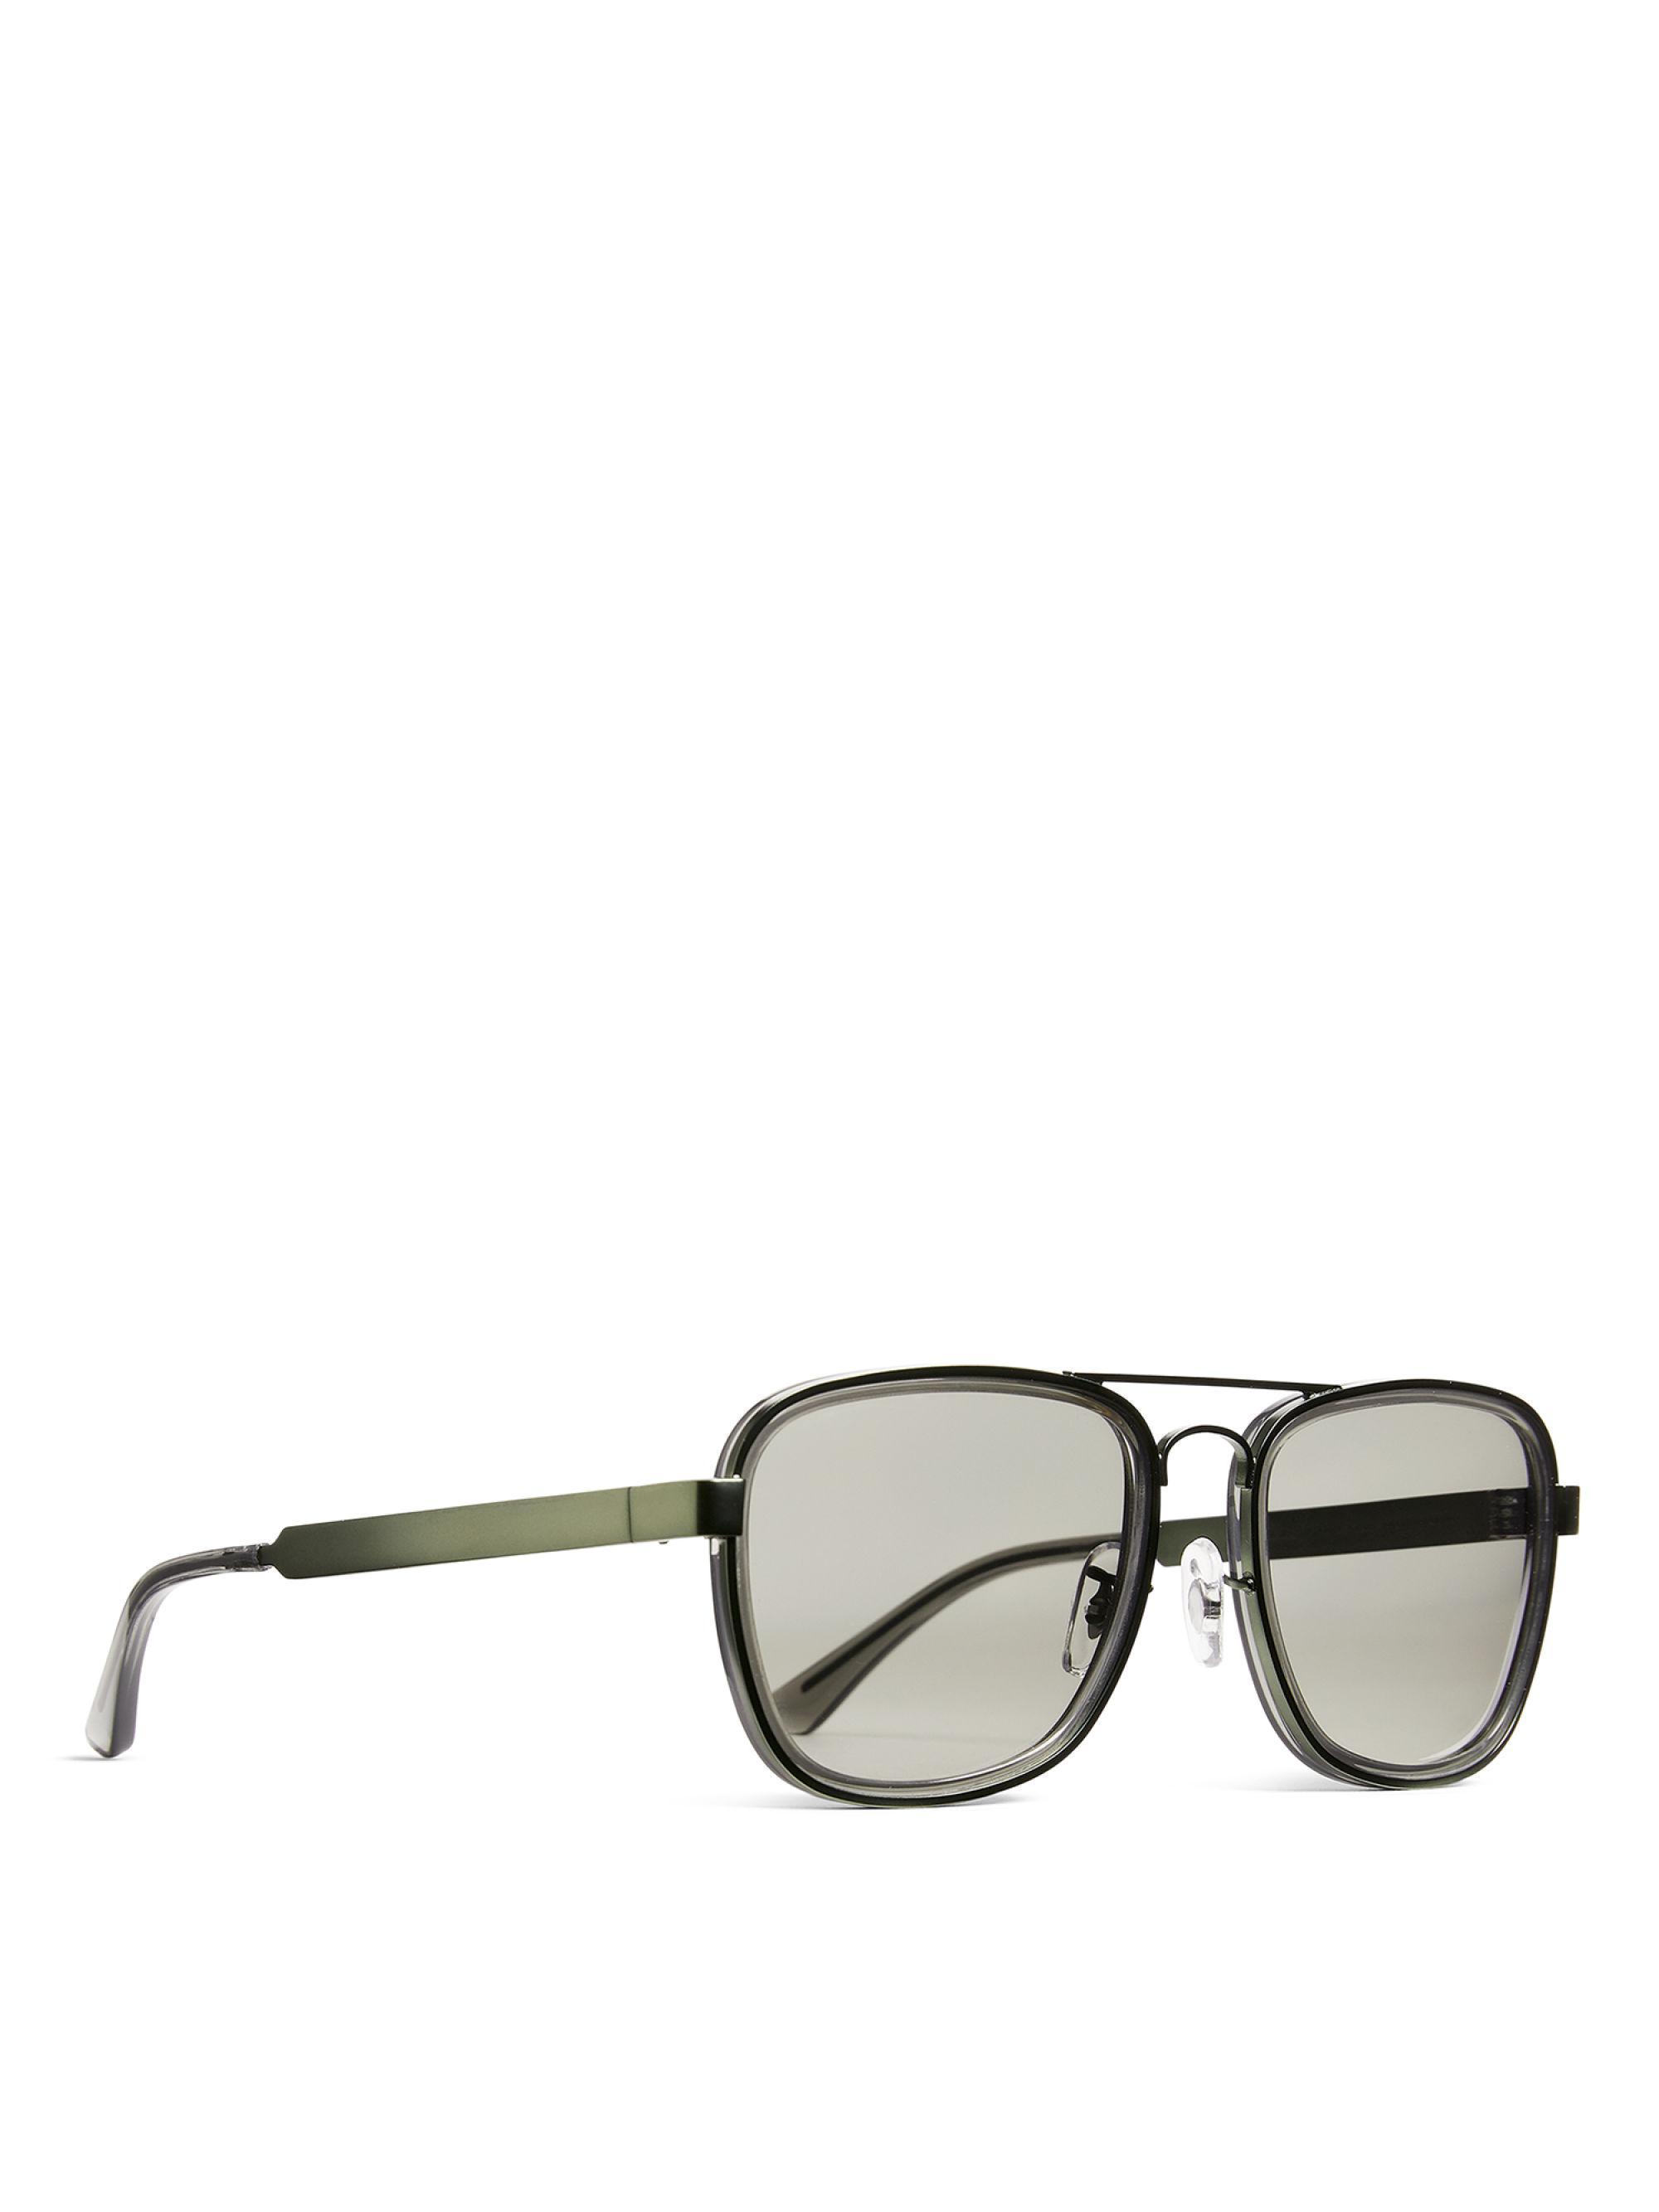 3c679c178af5 ARKET Square Aviator Sunglasses in Gray for Men - Lyst